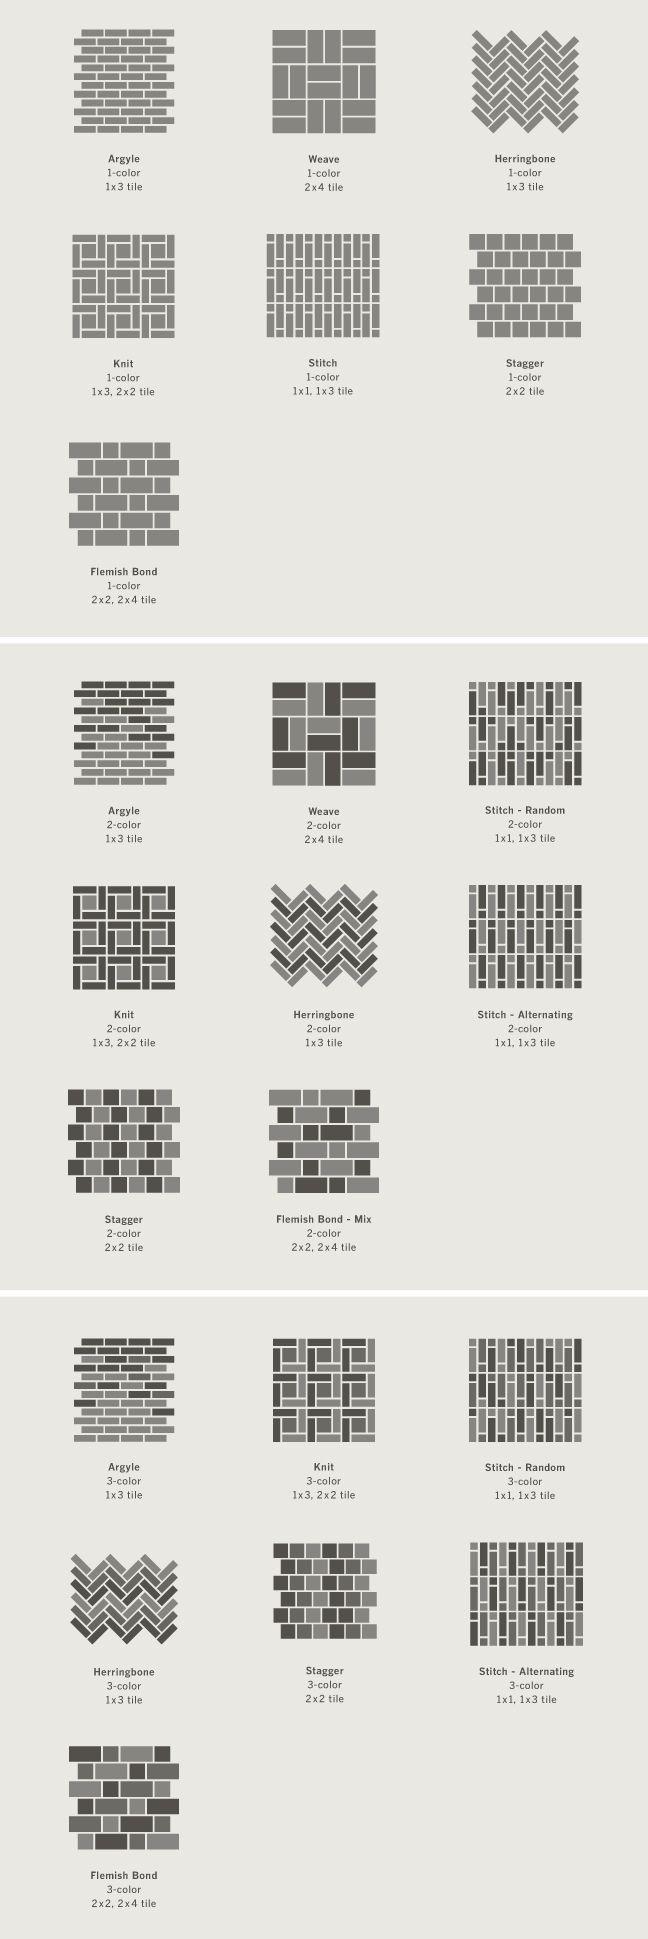 Tile layouts